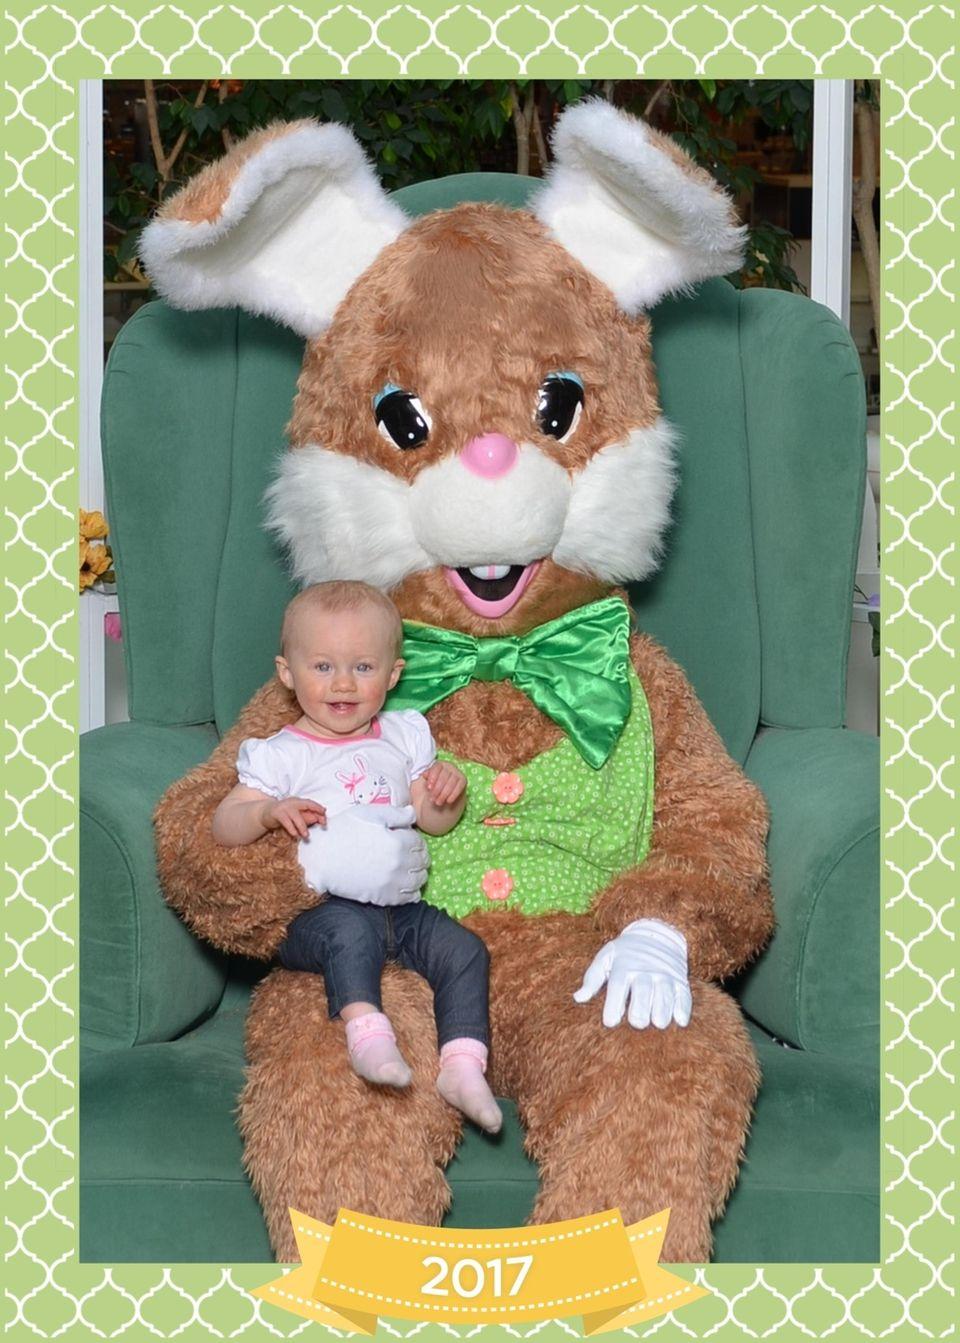 Trinity w her 1st Easter bunny